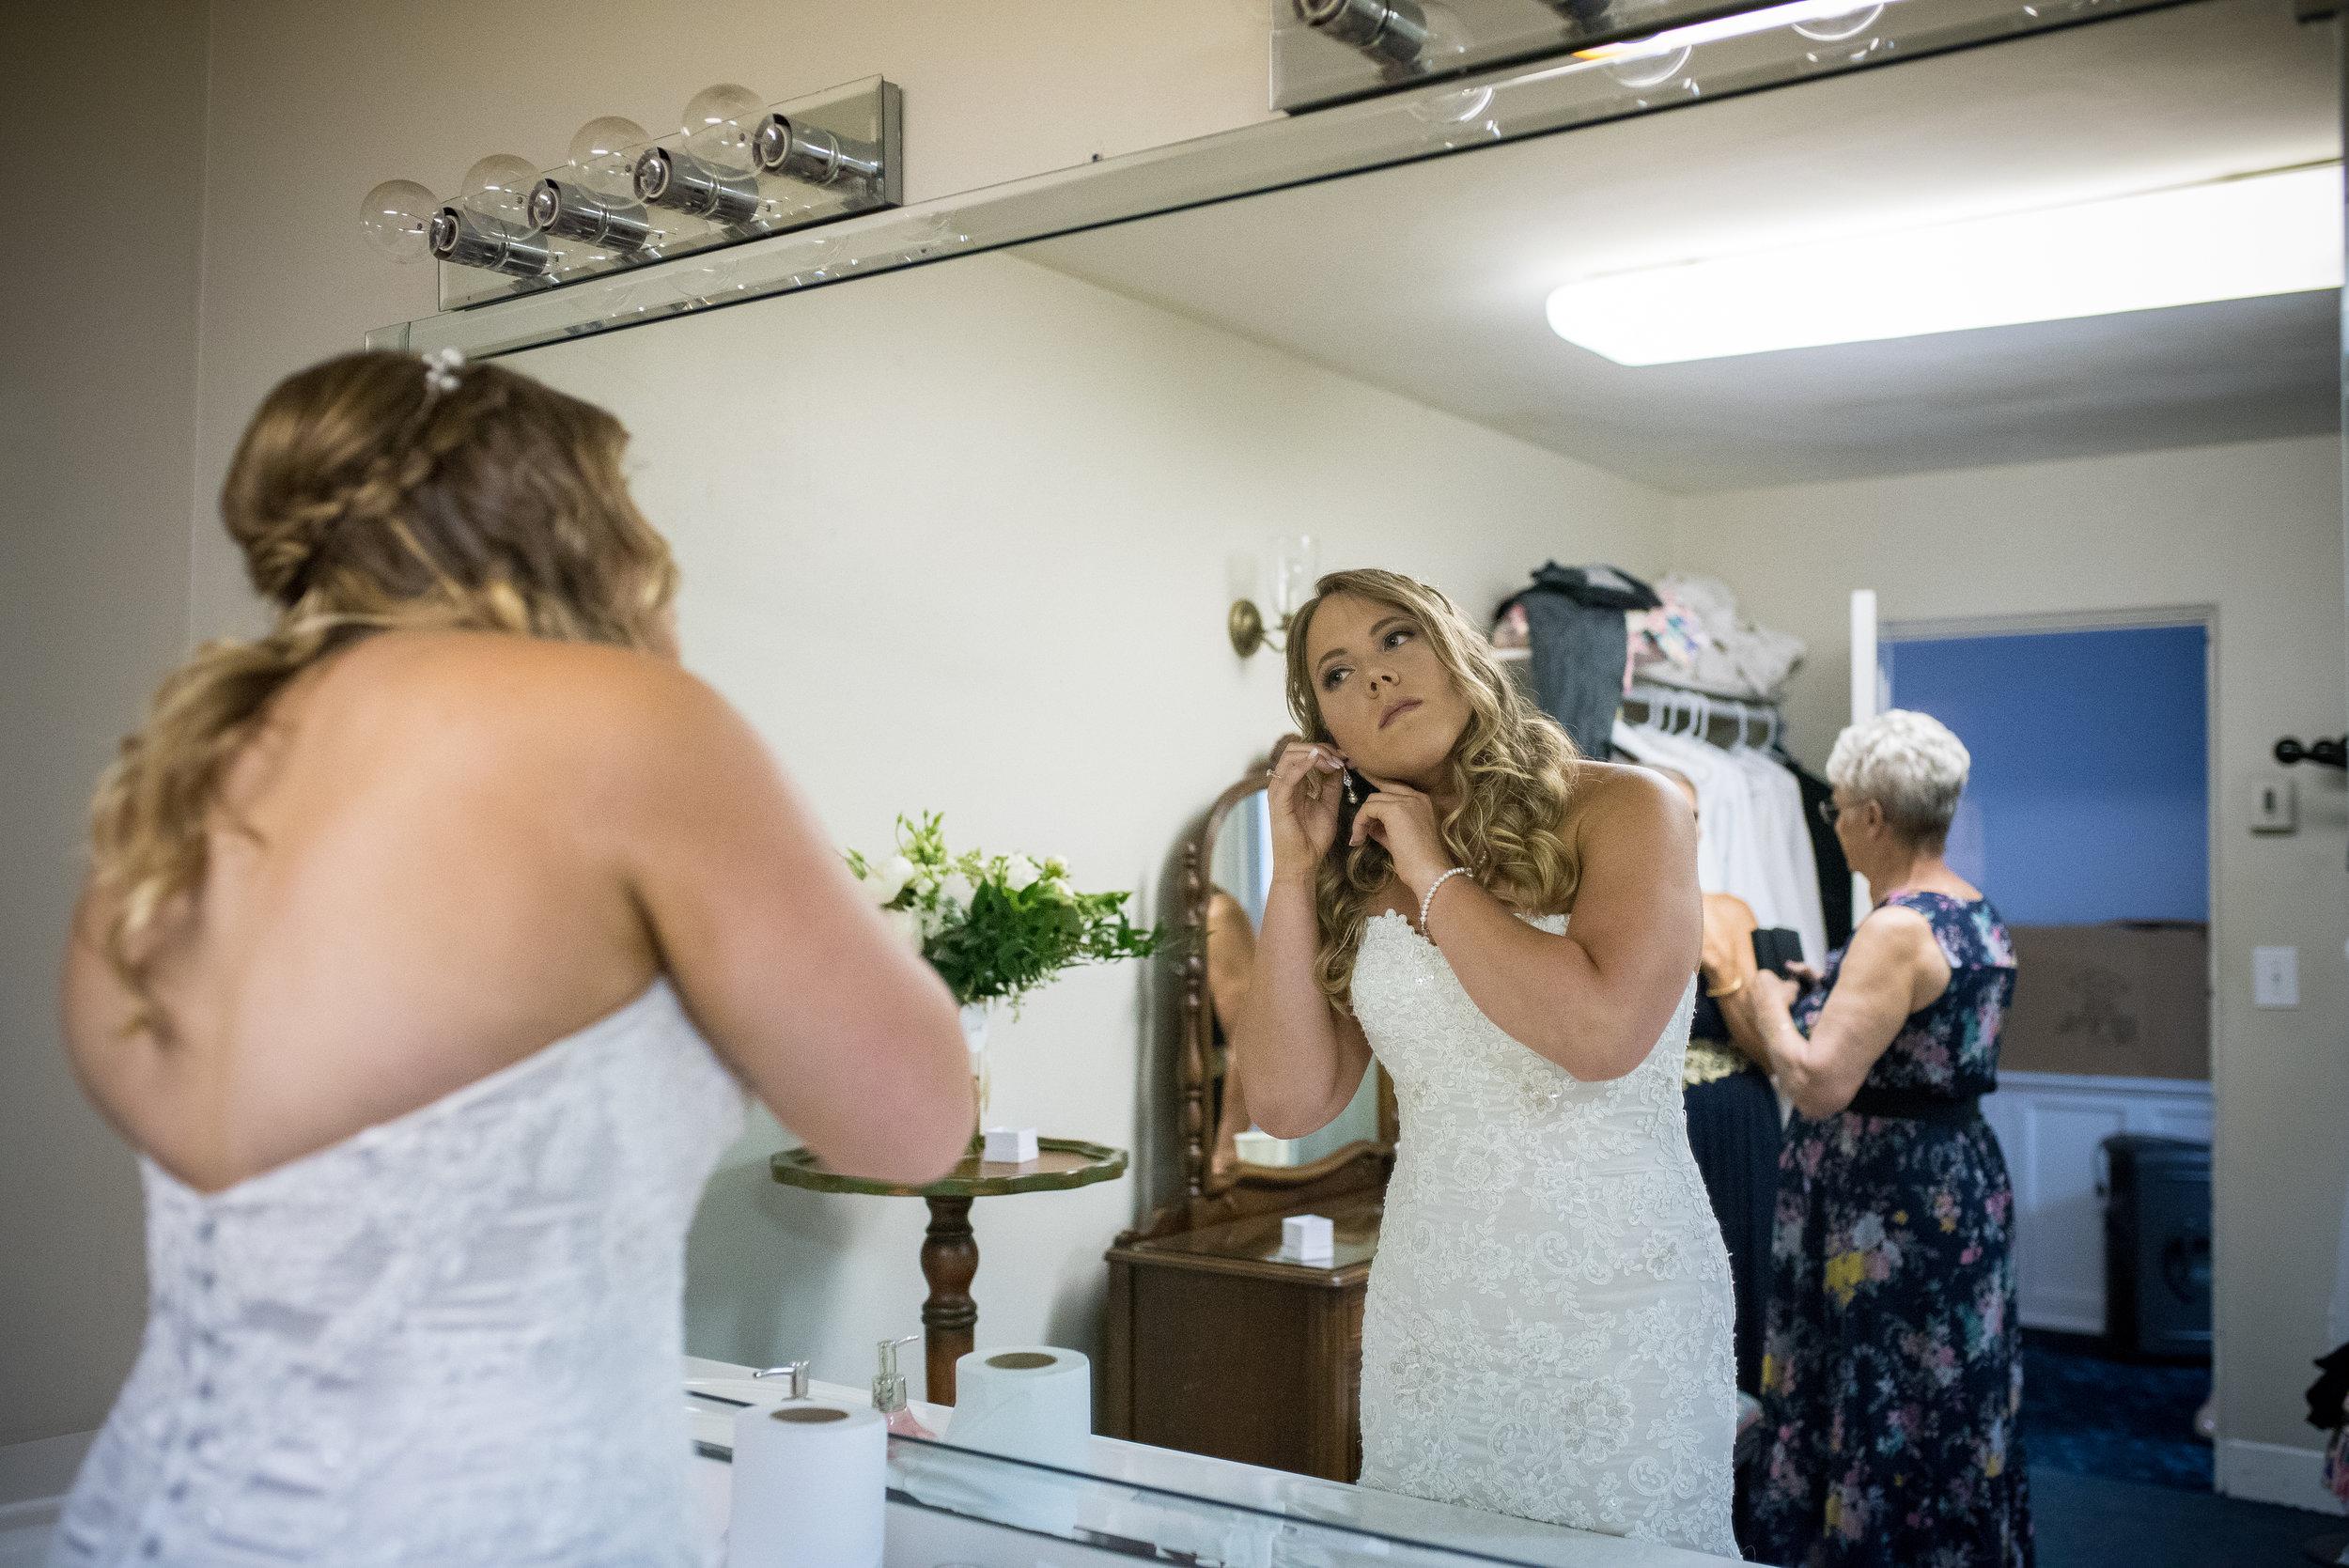 winston-salem wedding photographer - north carolina wedding photographer